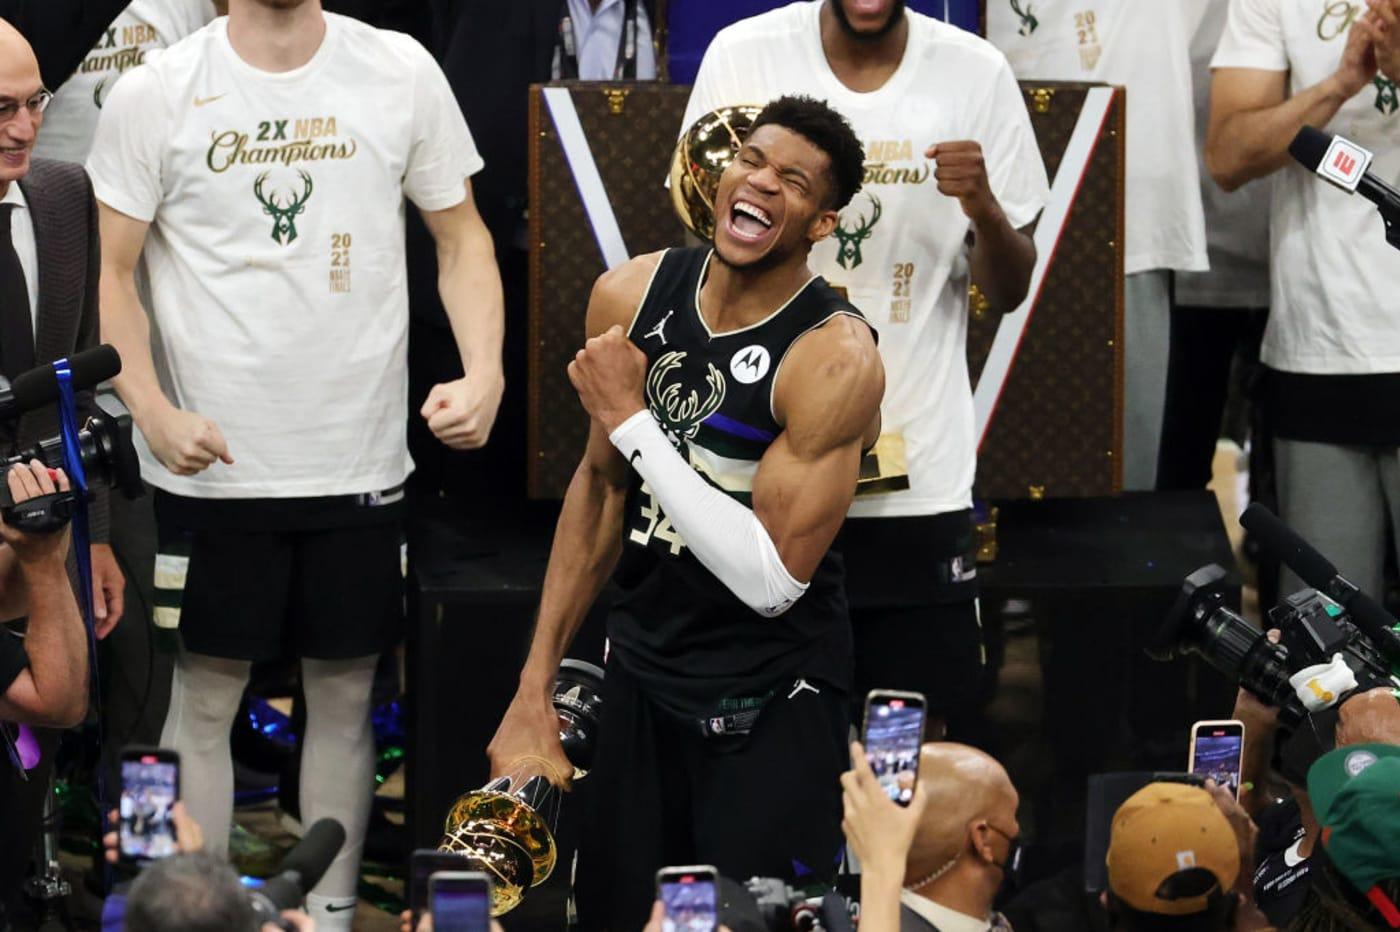 Giannis Antetokounmpo NBA Finals MVP Trophy Game 6 2021